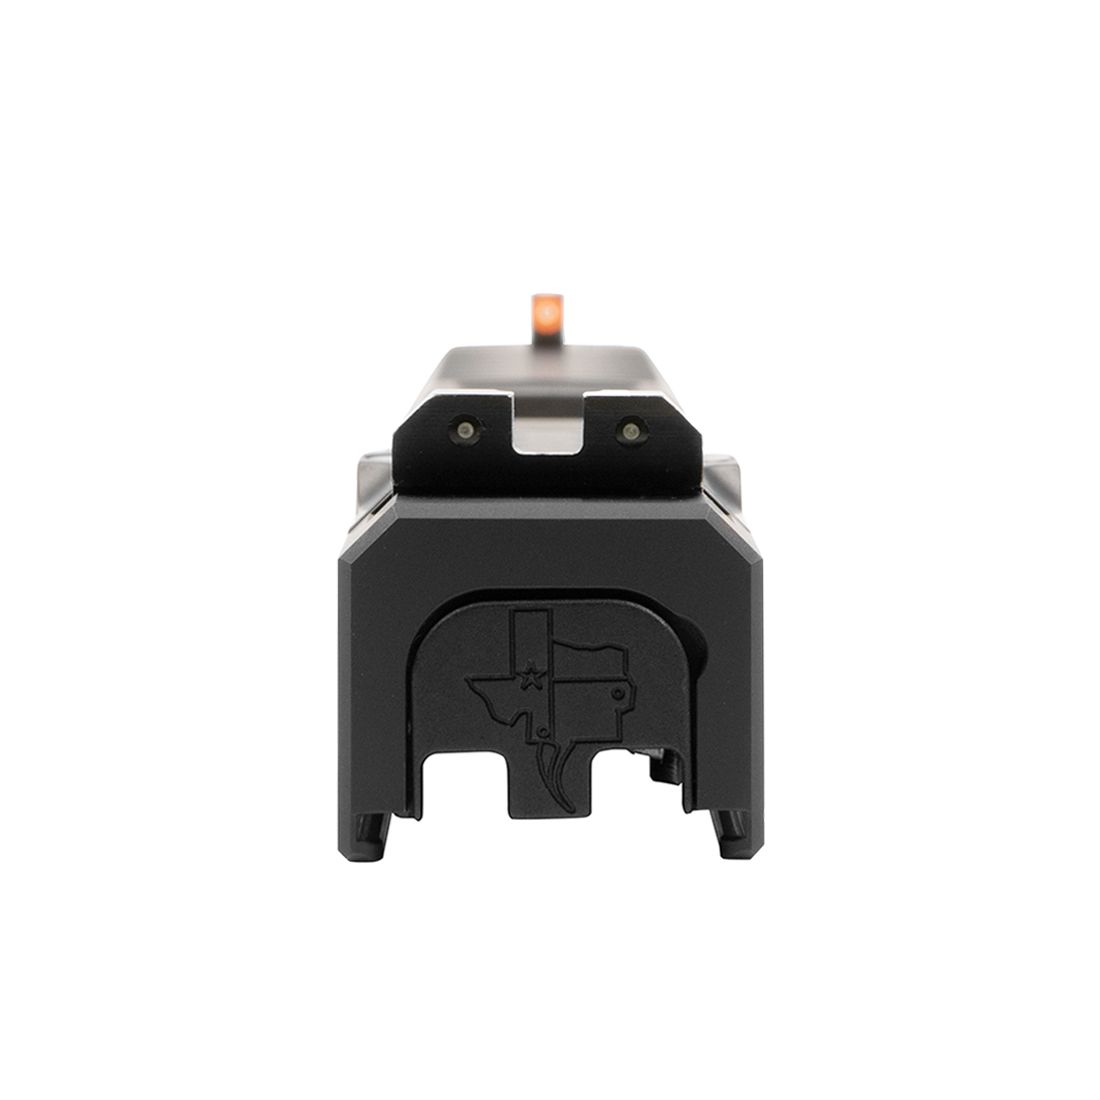 cmc triggers custom glock slide kragos glock 19 slide serrations